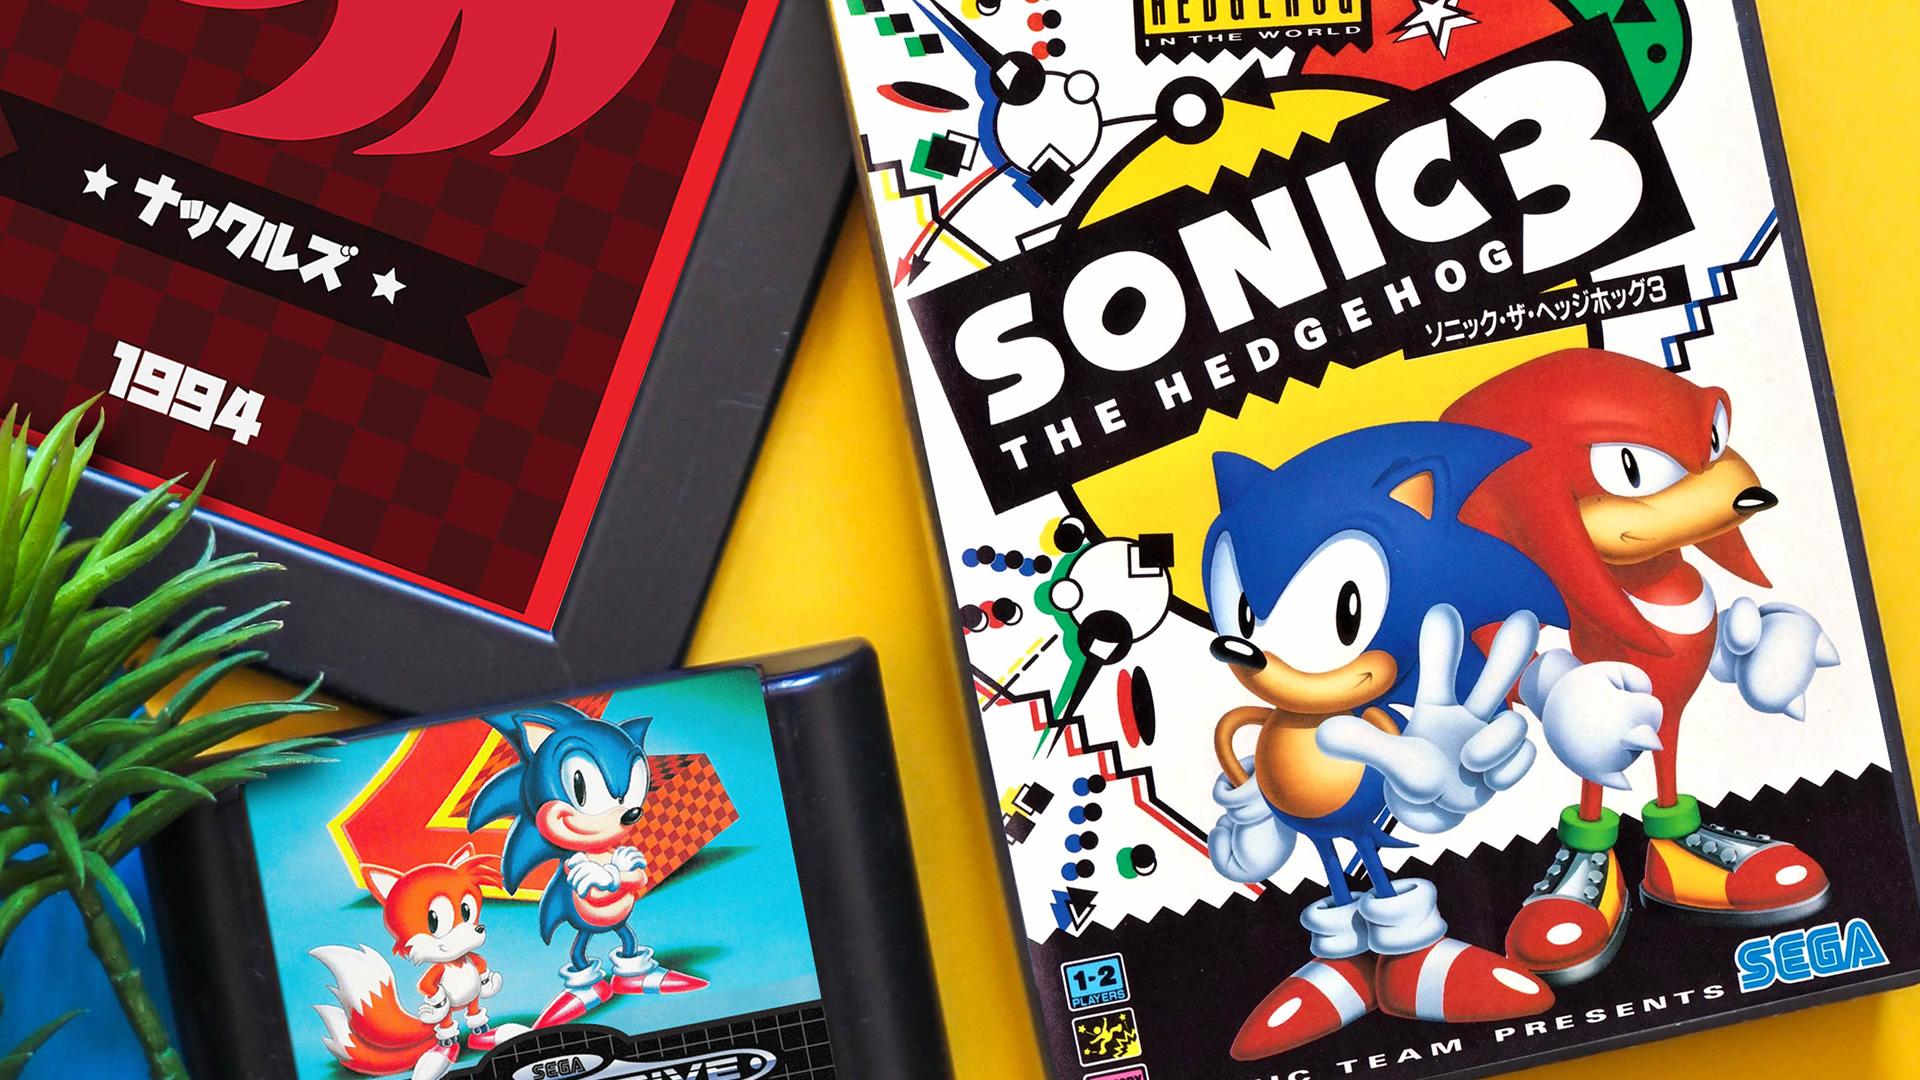 The Best Classic Sonic Music #SoundsLikeSonic